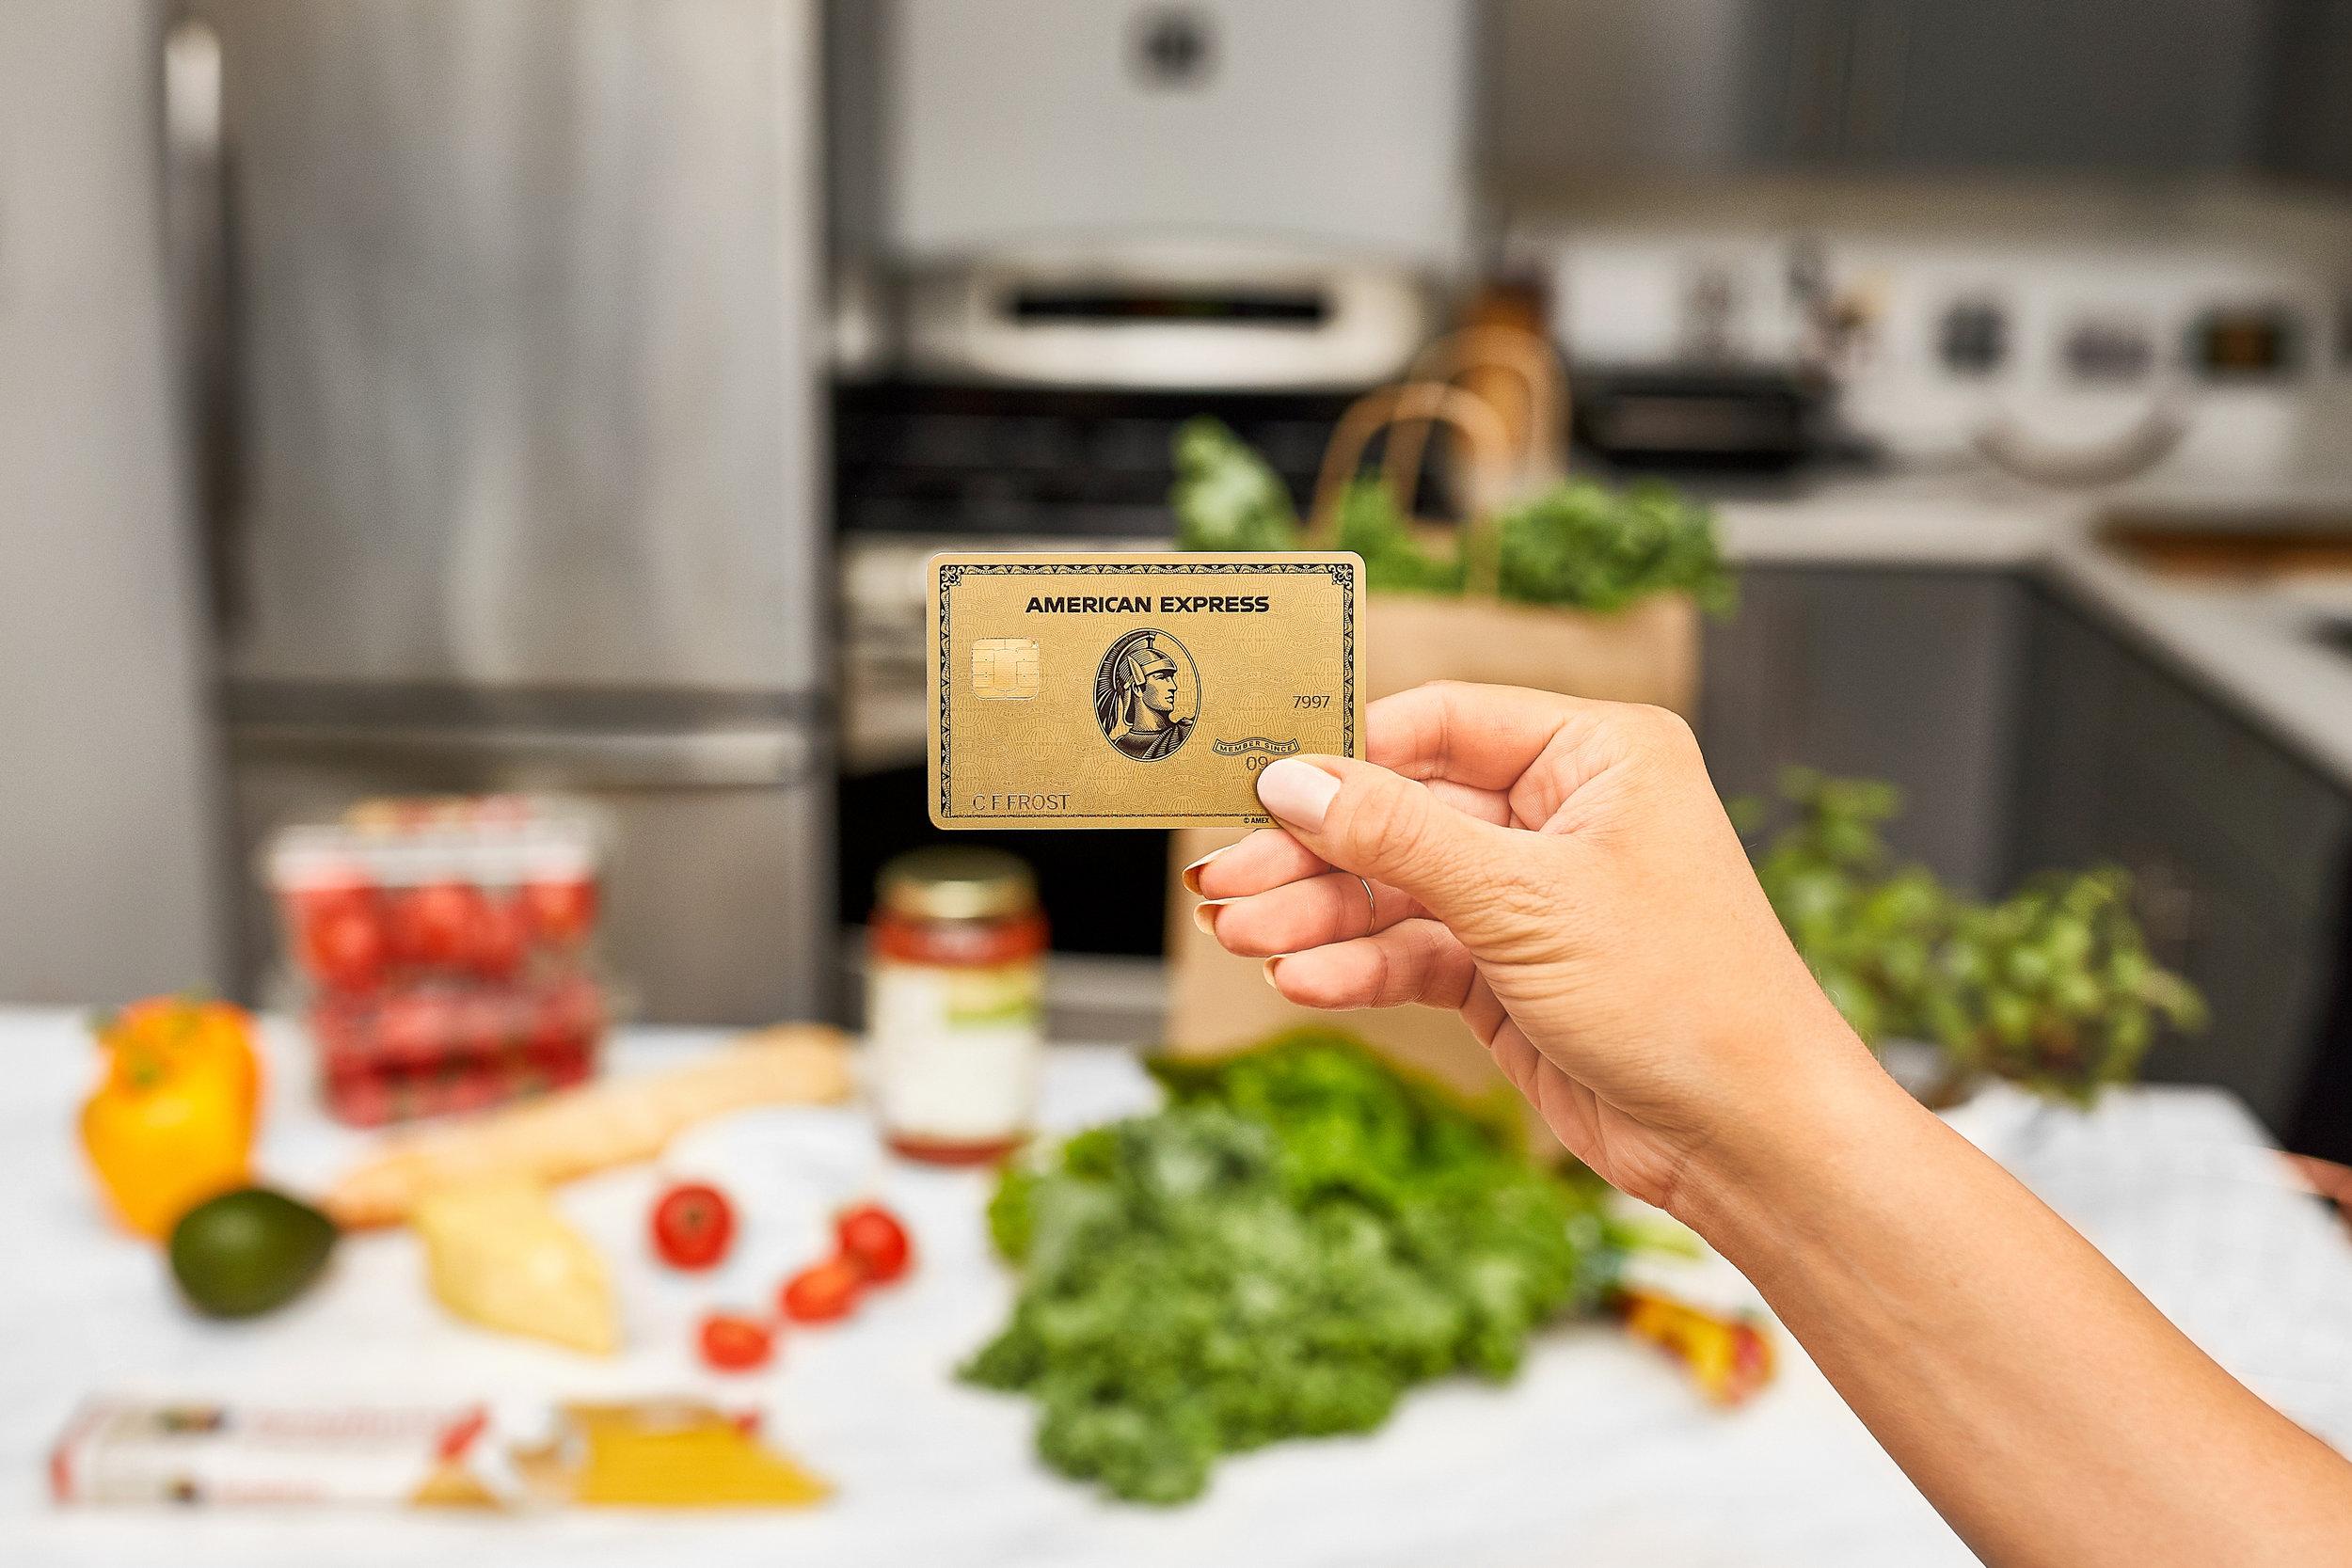 American_Express_Gold_Card-_4X_Supermarkets_0.jpg